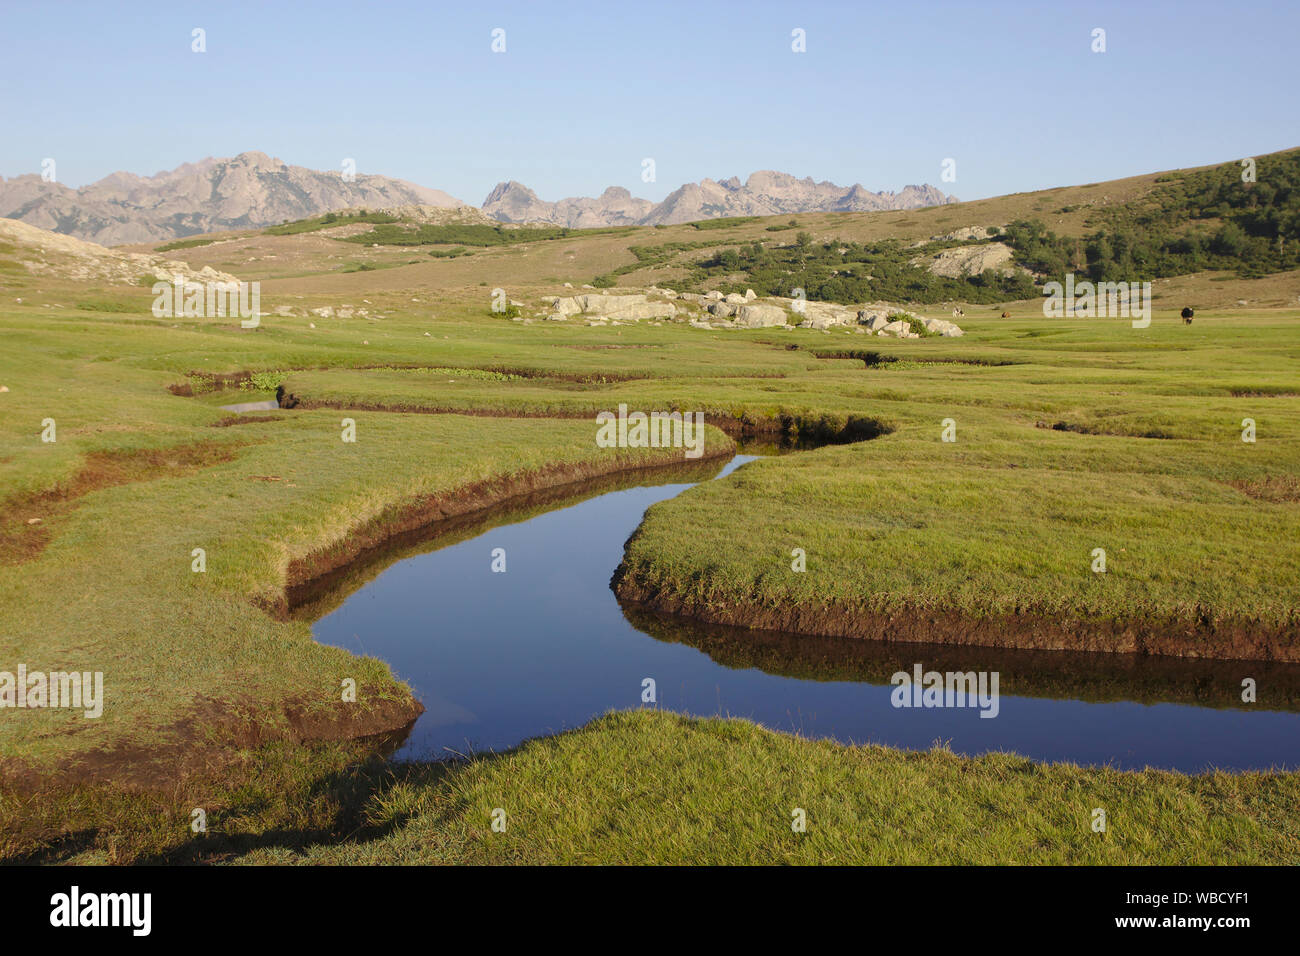 Streams and ponds, bog at Lac de Nino, France, Corsica, GR20 Stock Photo